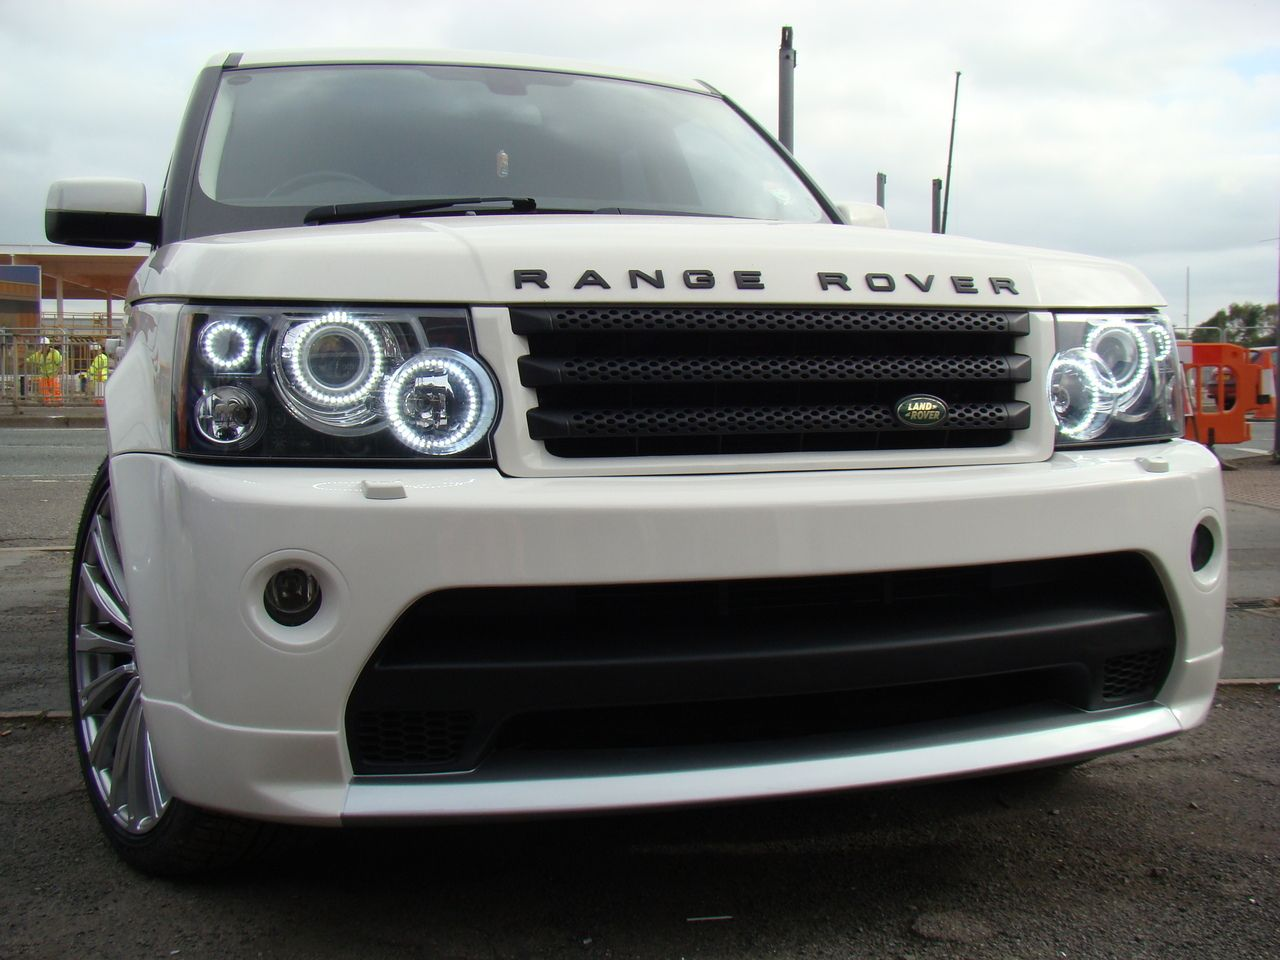 Range Rover Sport Headlight Conversion To 2012 Spec Led Lighting